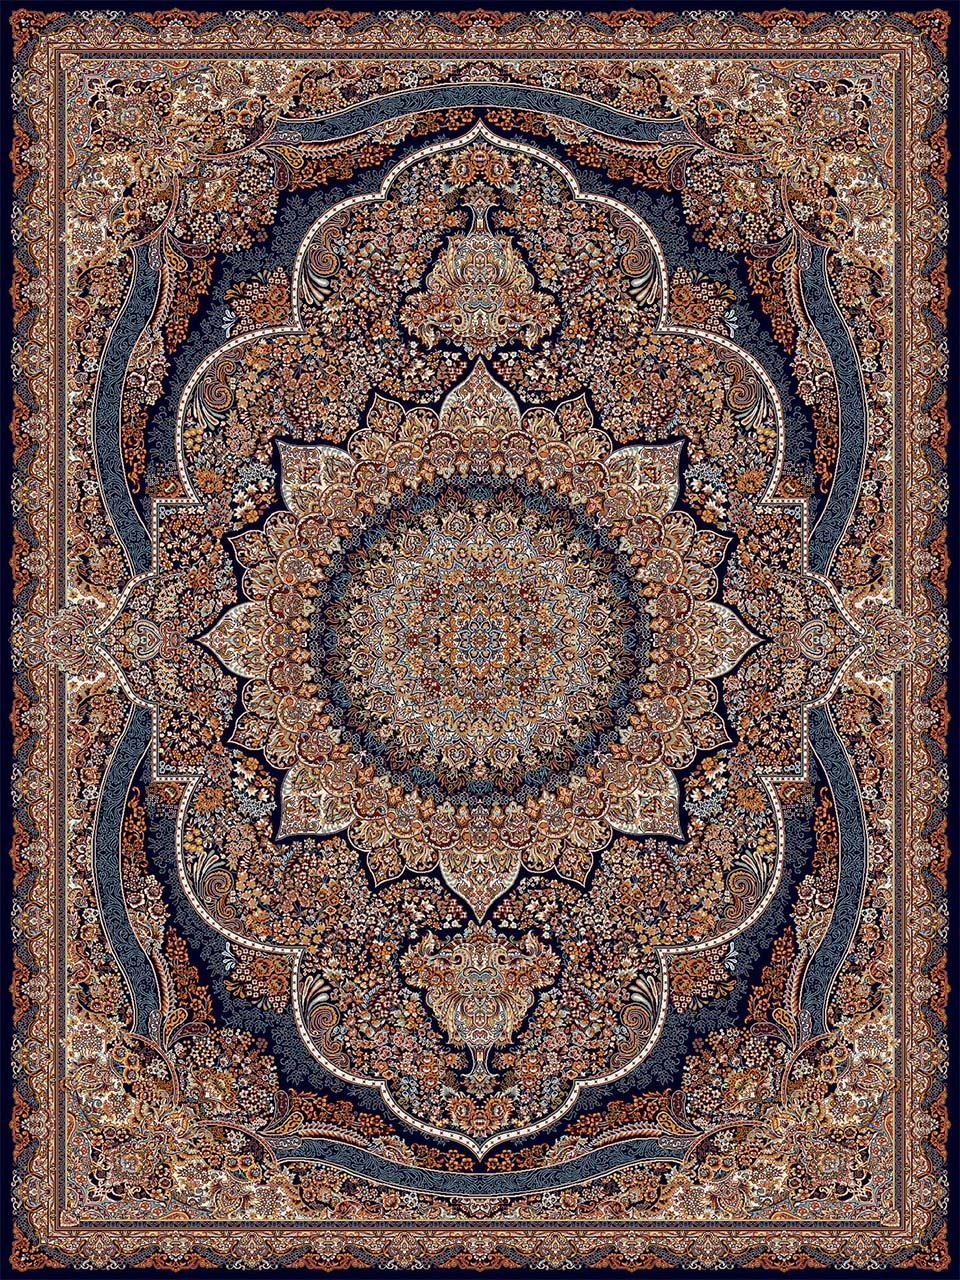 فرش (18133) اکریلیک - 8 رنگ - 500 شانه - سورمه اي - تراکم 1000